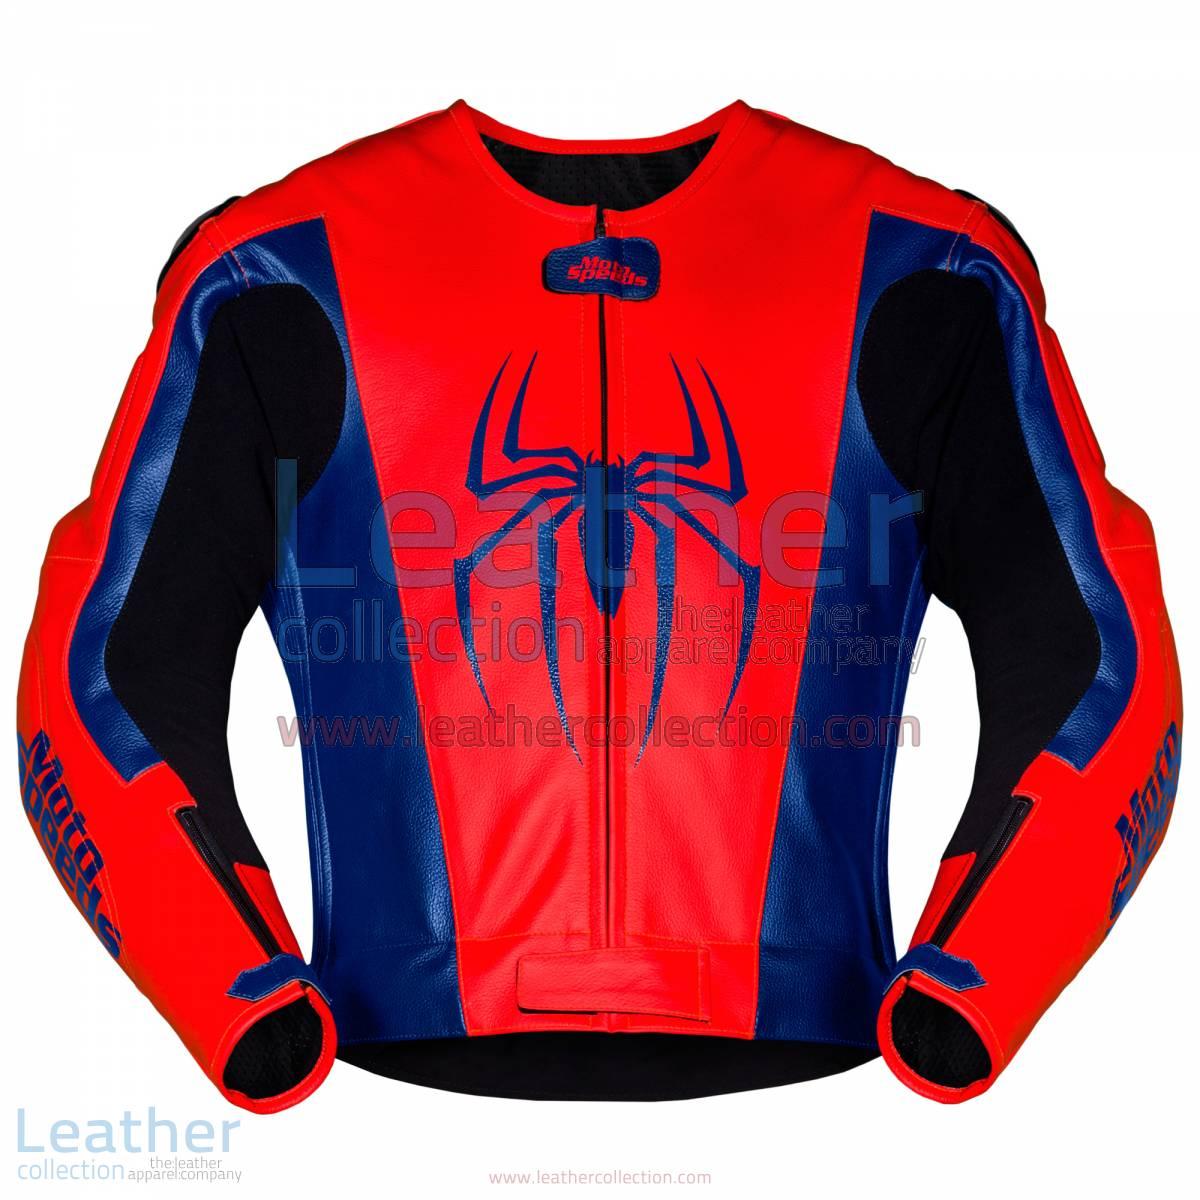 Spiderman Leather Motorcycle Jacket   Spiderman Leather Motorcycle Jacket